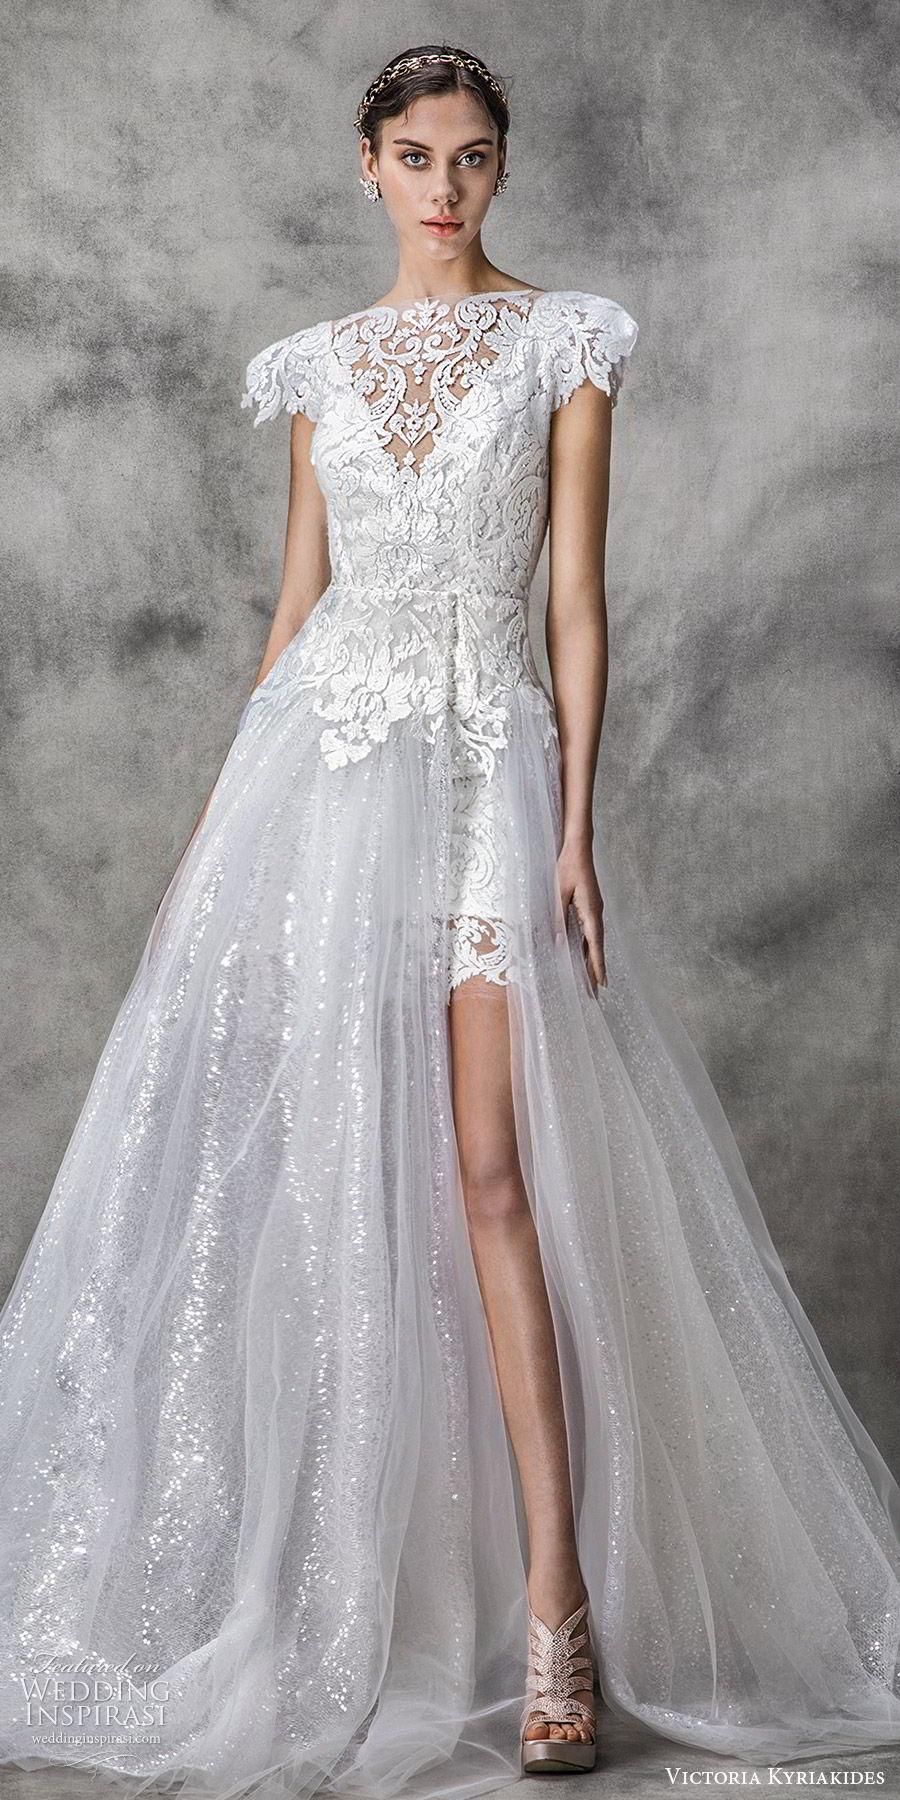 victoria kyriakides spring 2020 bridal short puff sleeves bateau neckline slit skirt fully embellished lace a line ball gown wedding dress (5) chapel train modern romantic mv